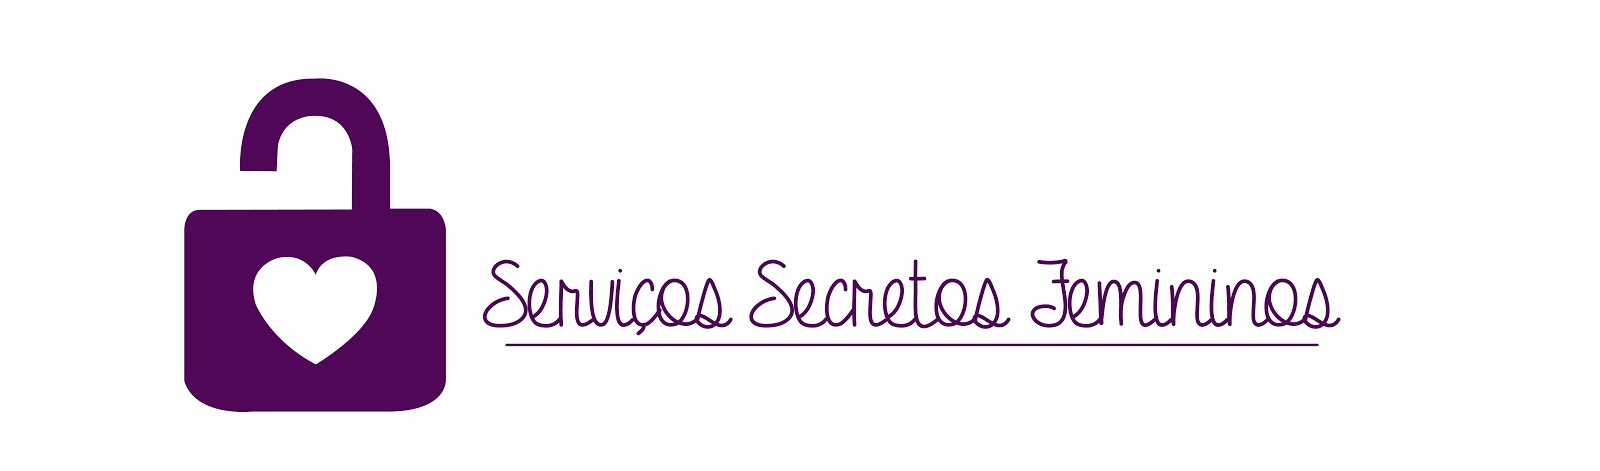 Serviços Secretos Femininos